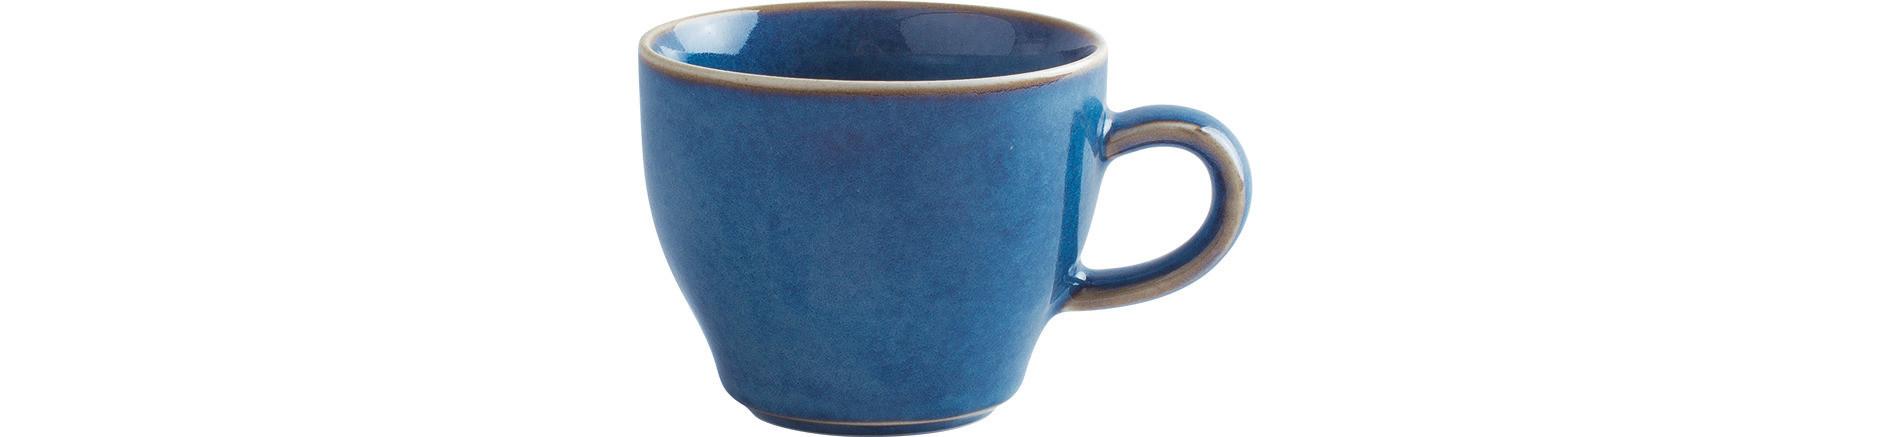 Homestyle, Cappuccinotasse Italiano ø 85 mm / 0,18 l atlantic blue